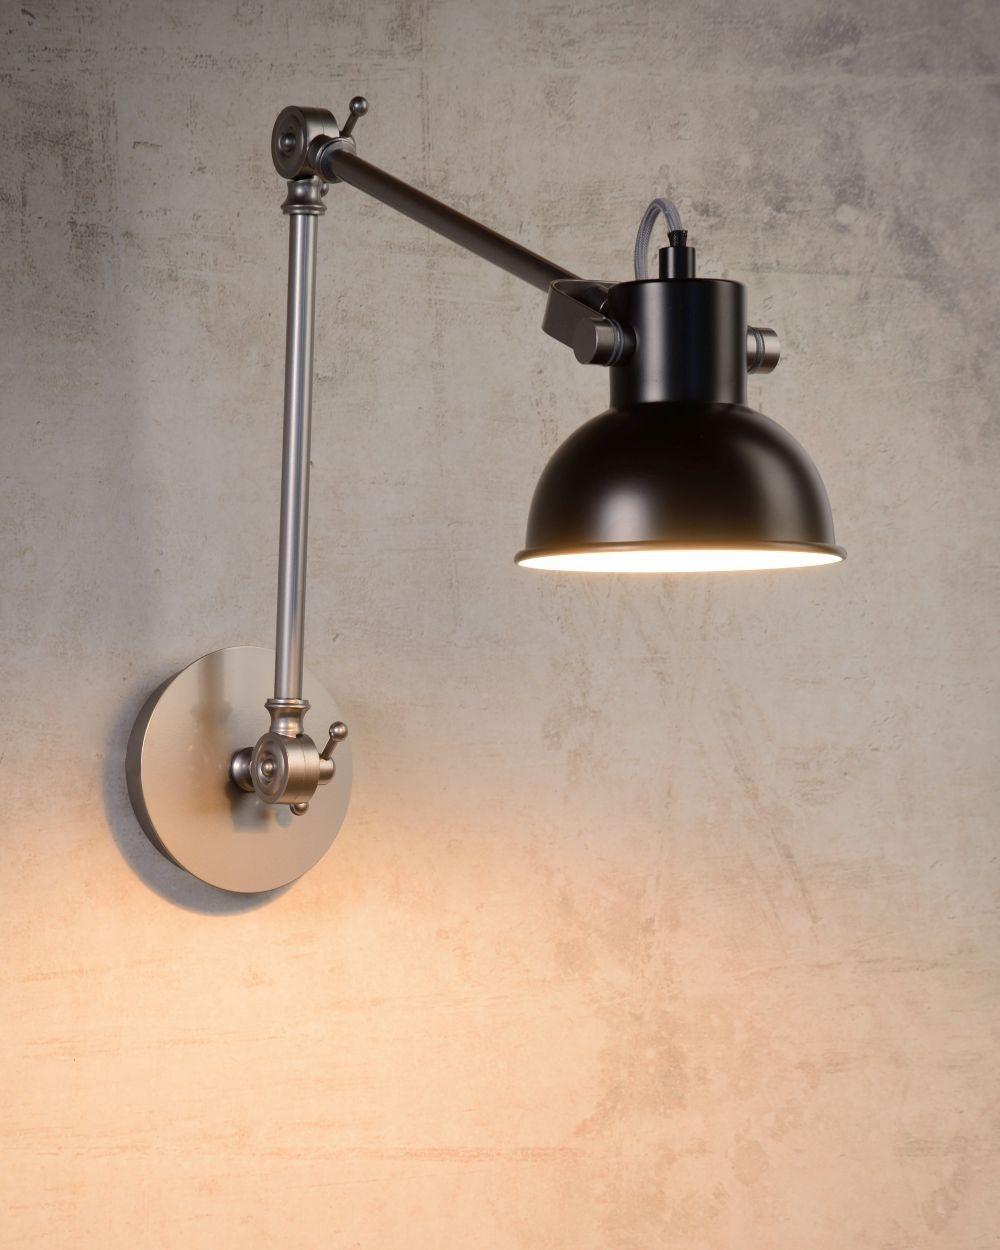 Wandlampe schwarz Industrie, Wandleuchte schwarz Industriedesign, Arm-Wandlampe